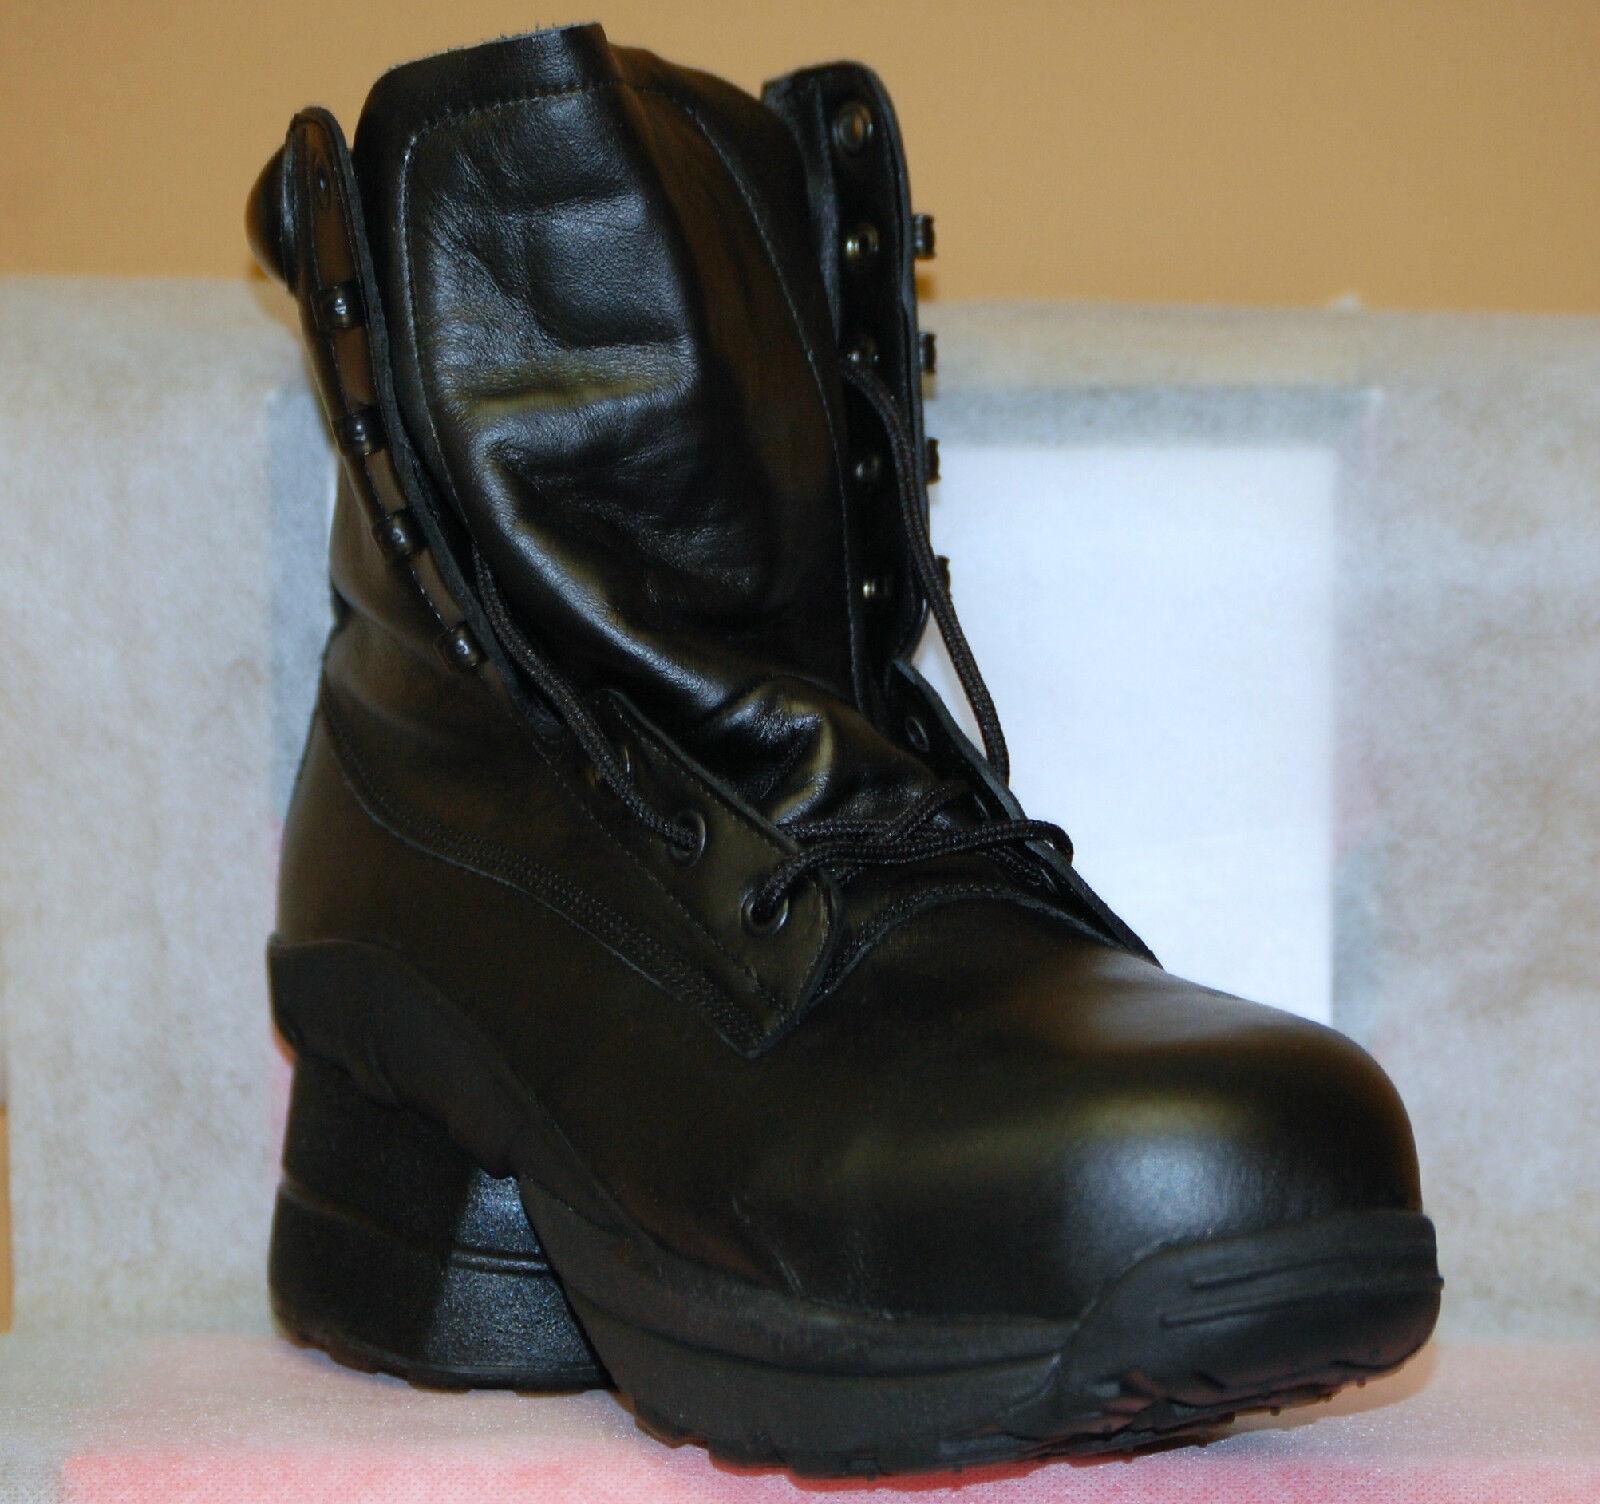 Z-Coil Prime Workboot FW-K6000 FW-K6000 FW-K6000 Women's Black Leather Size 10 regular toe 496c23